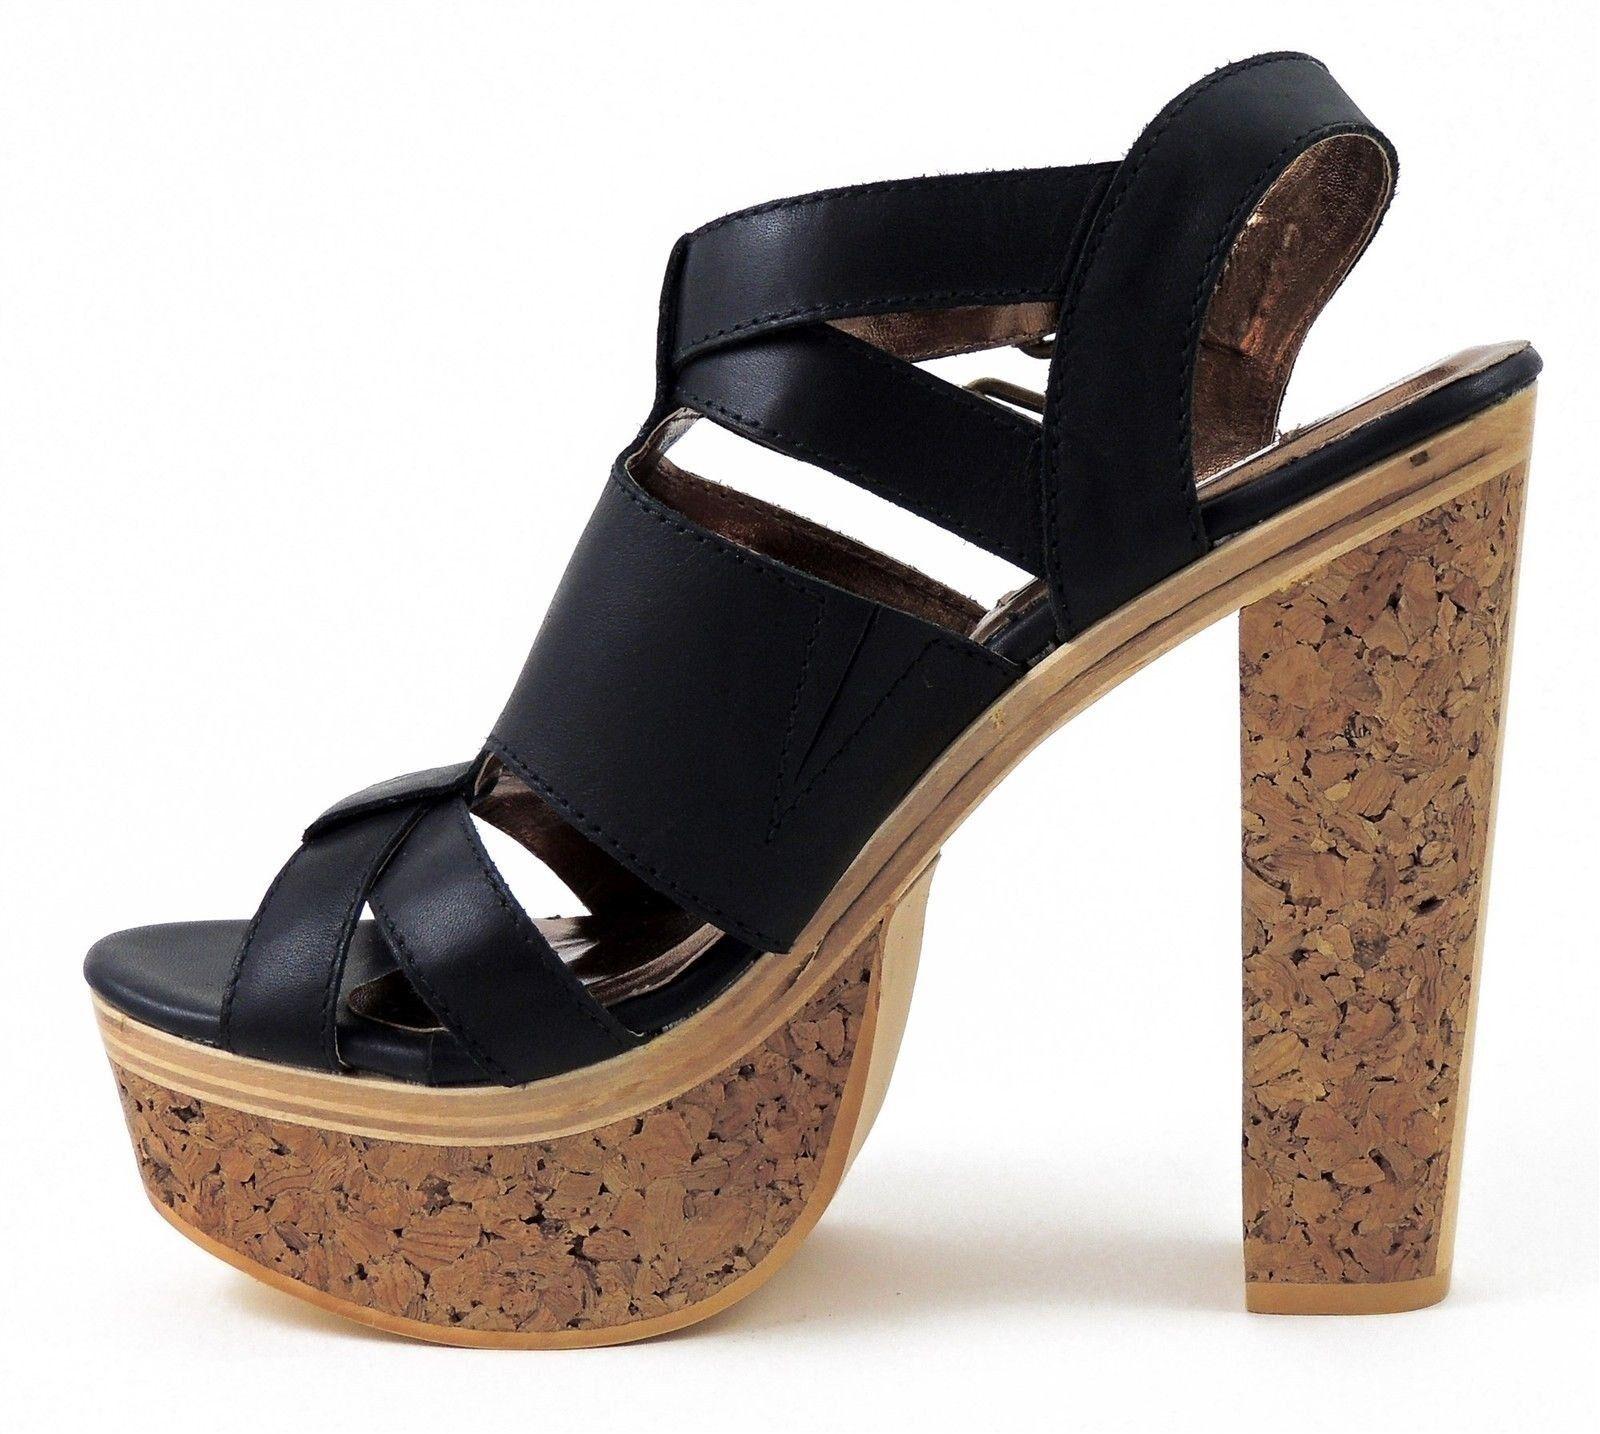 Cynthia Vincent Women's Women's Women's Petra Platform Sandals Black Leather Size 8 (B, M) 20bf84